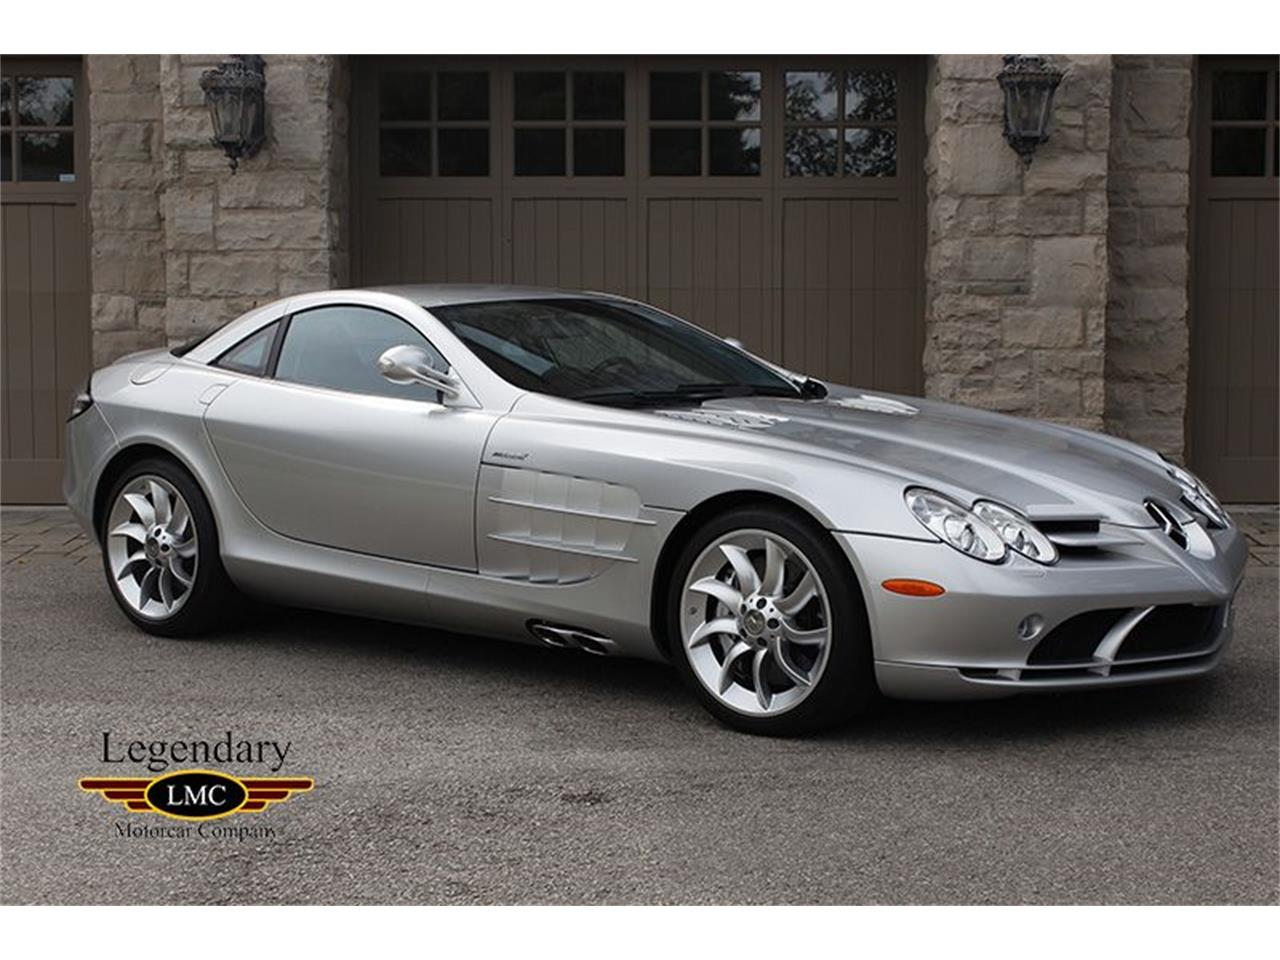 2005 Mercedes-Benz SLR McLaren for Sale | ClassicCars.com ...